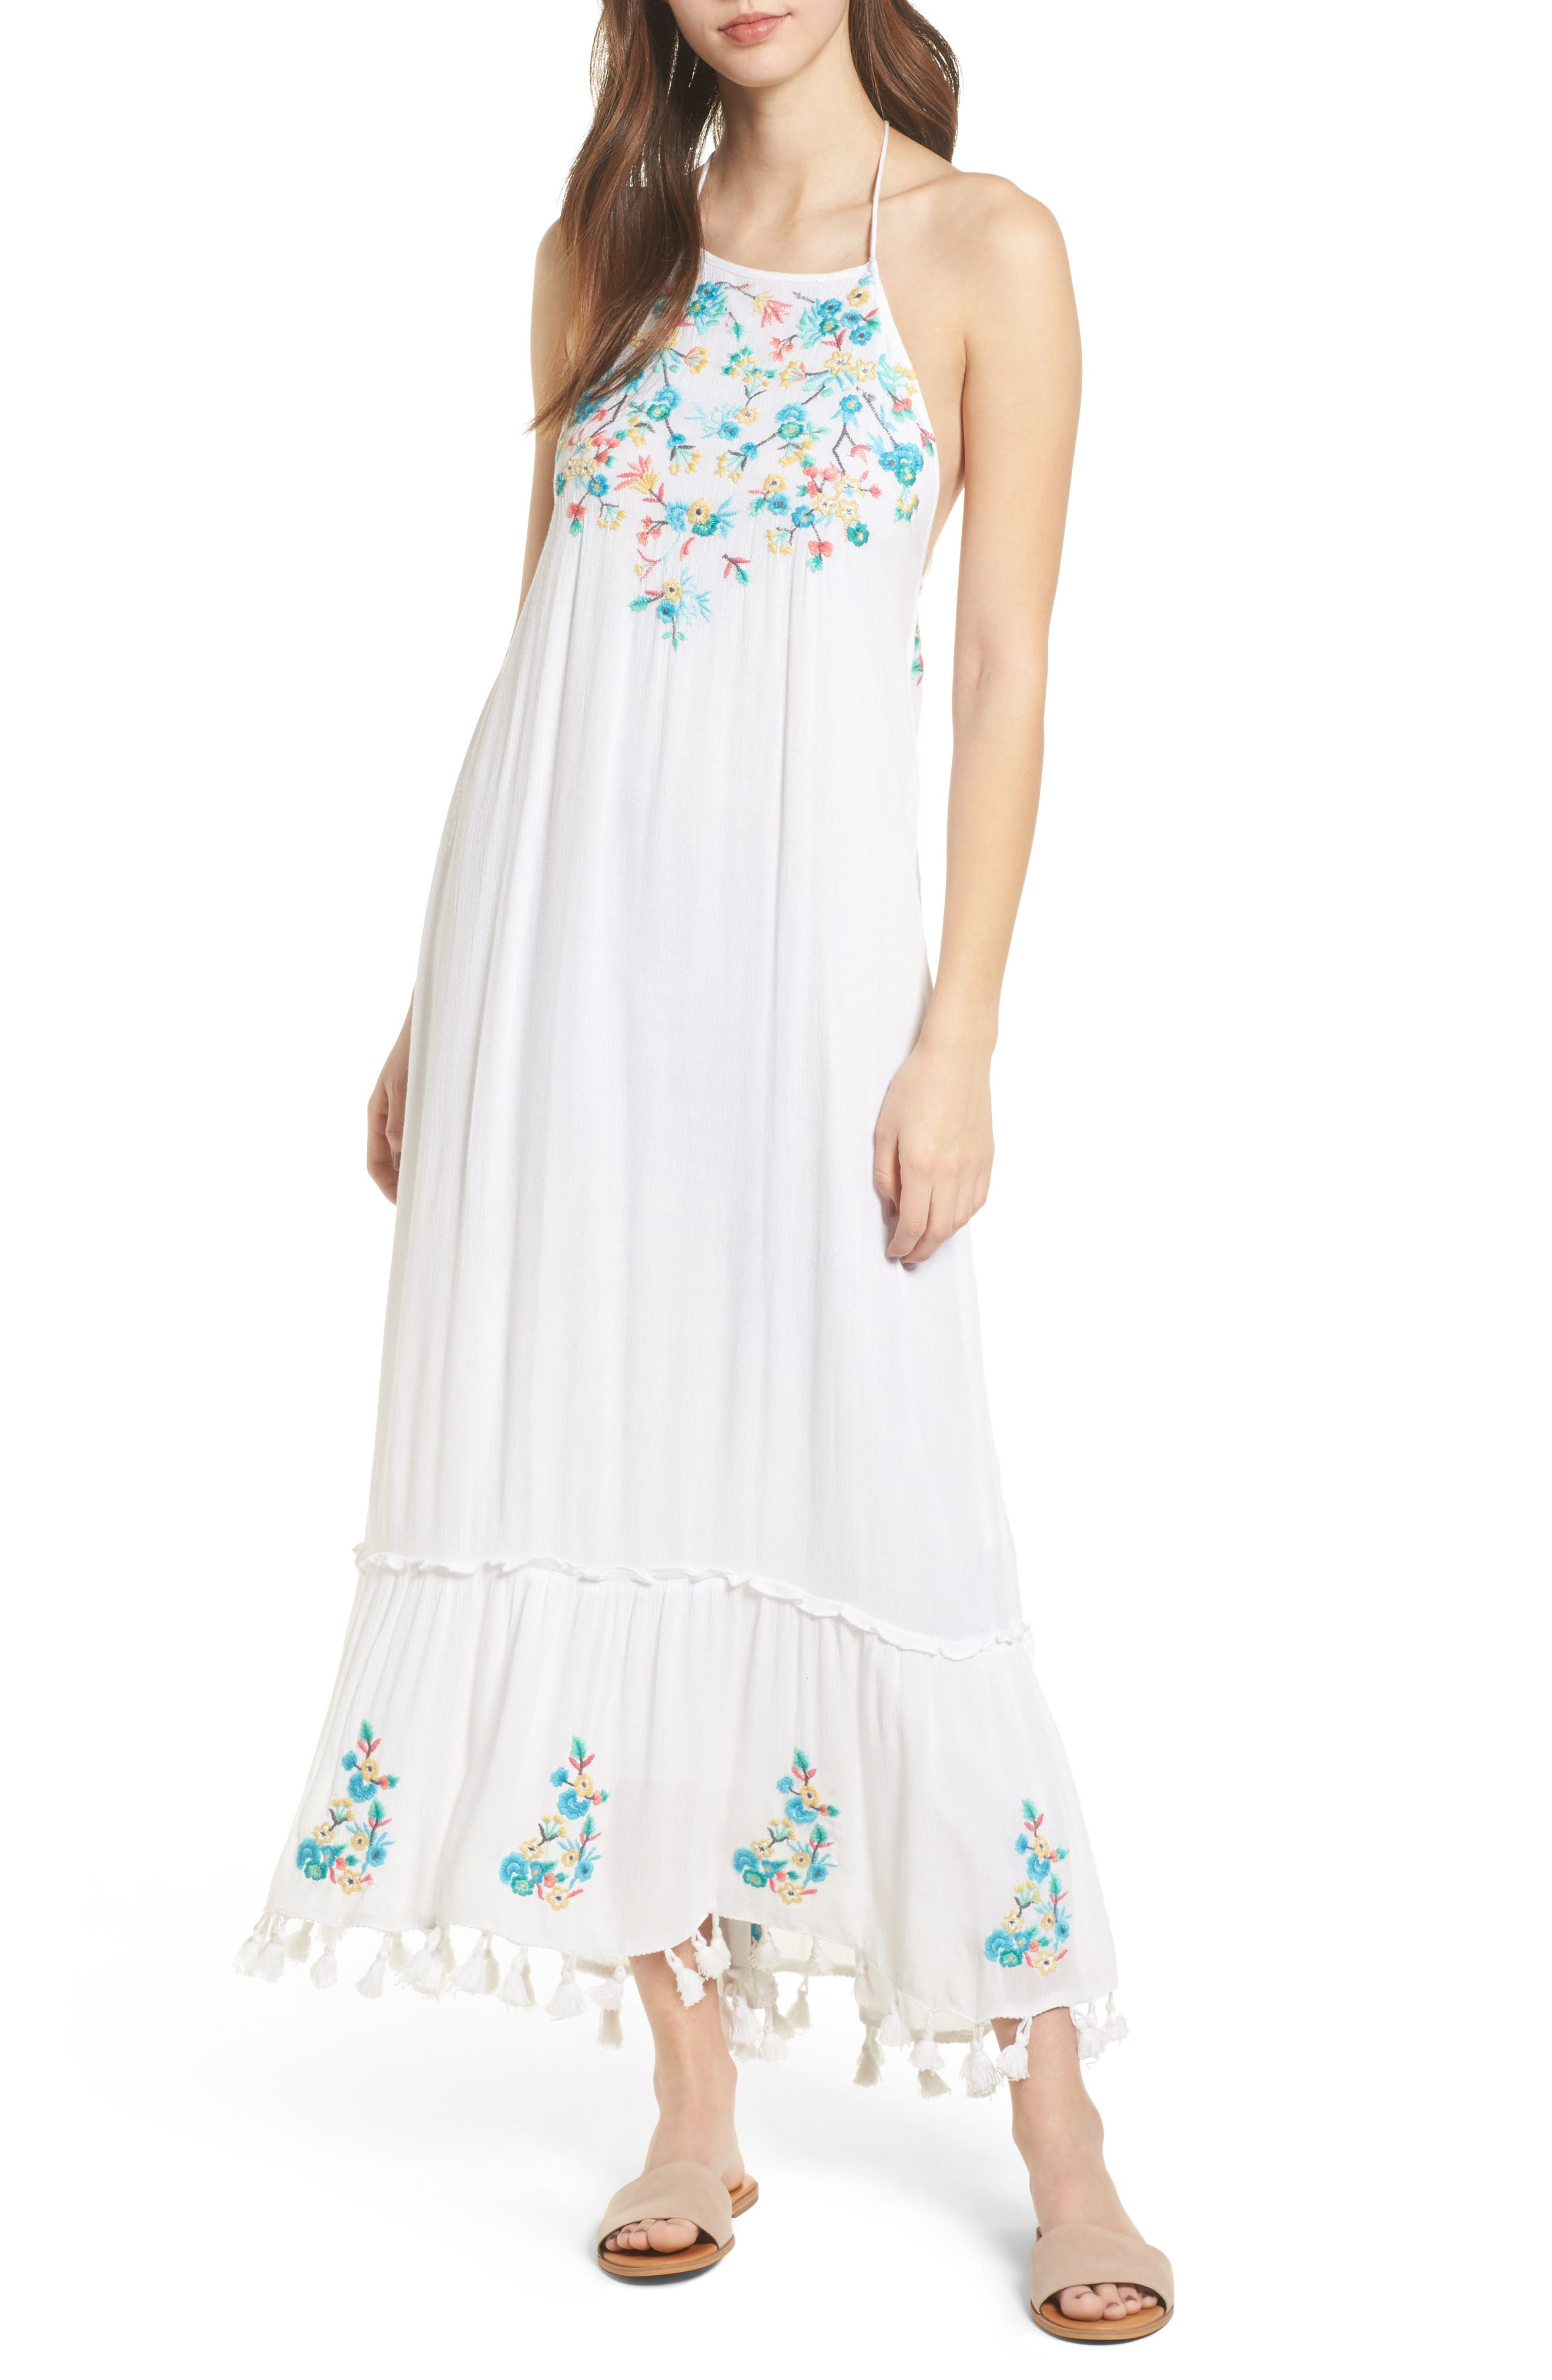 Main Image - Raga Ashlyn Embroidered Tassel Trim Maxi Dress